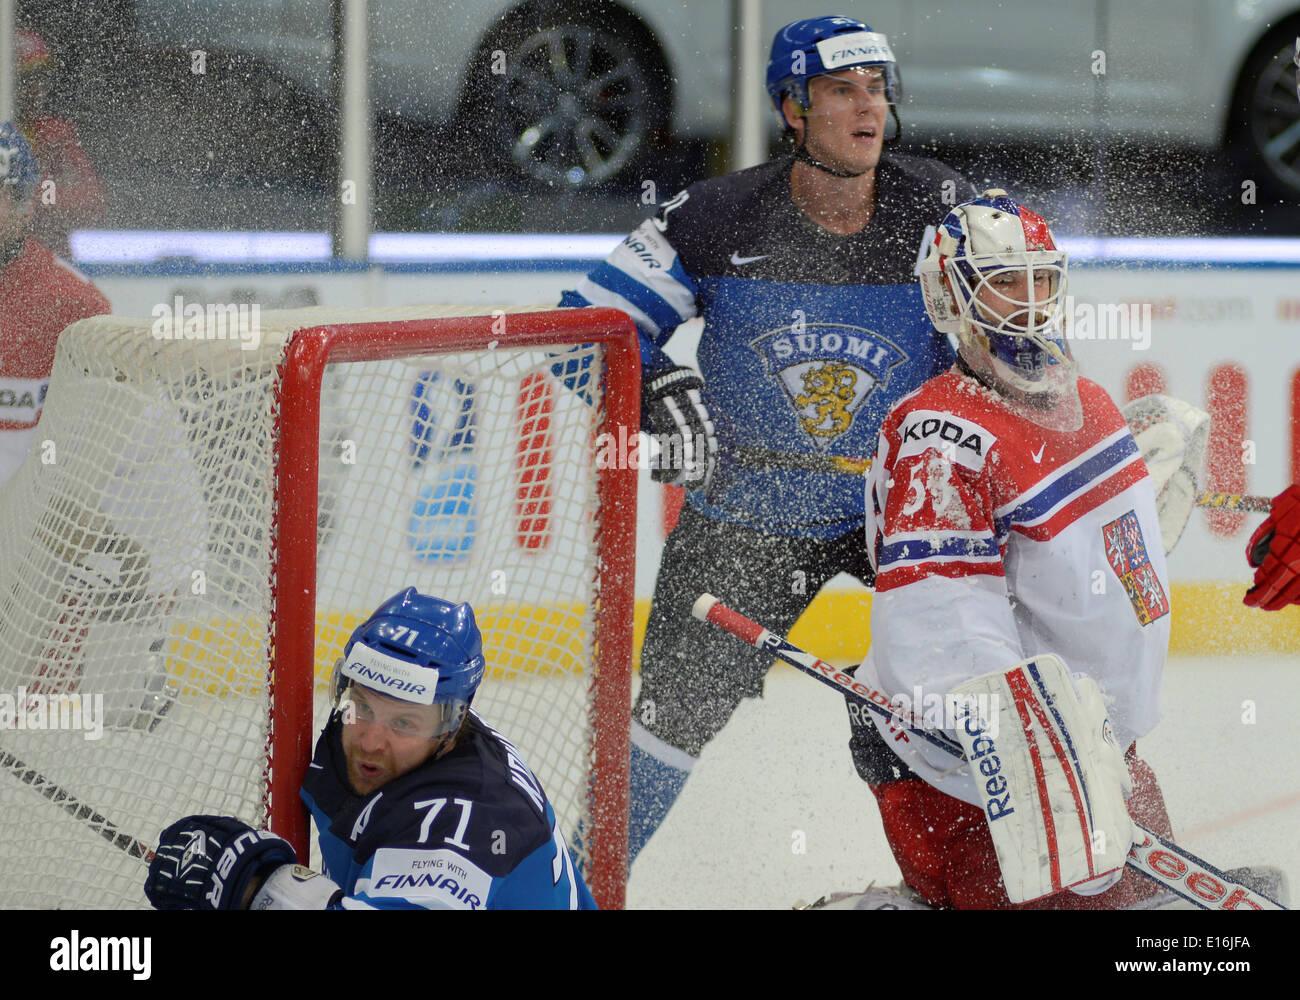 KOMAROV Leo (71) of Finland and SALAK Alexander during 2014 IIHF World Ice Hockey Championship semifinal match at Minsk Arena - Stock Image